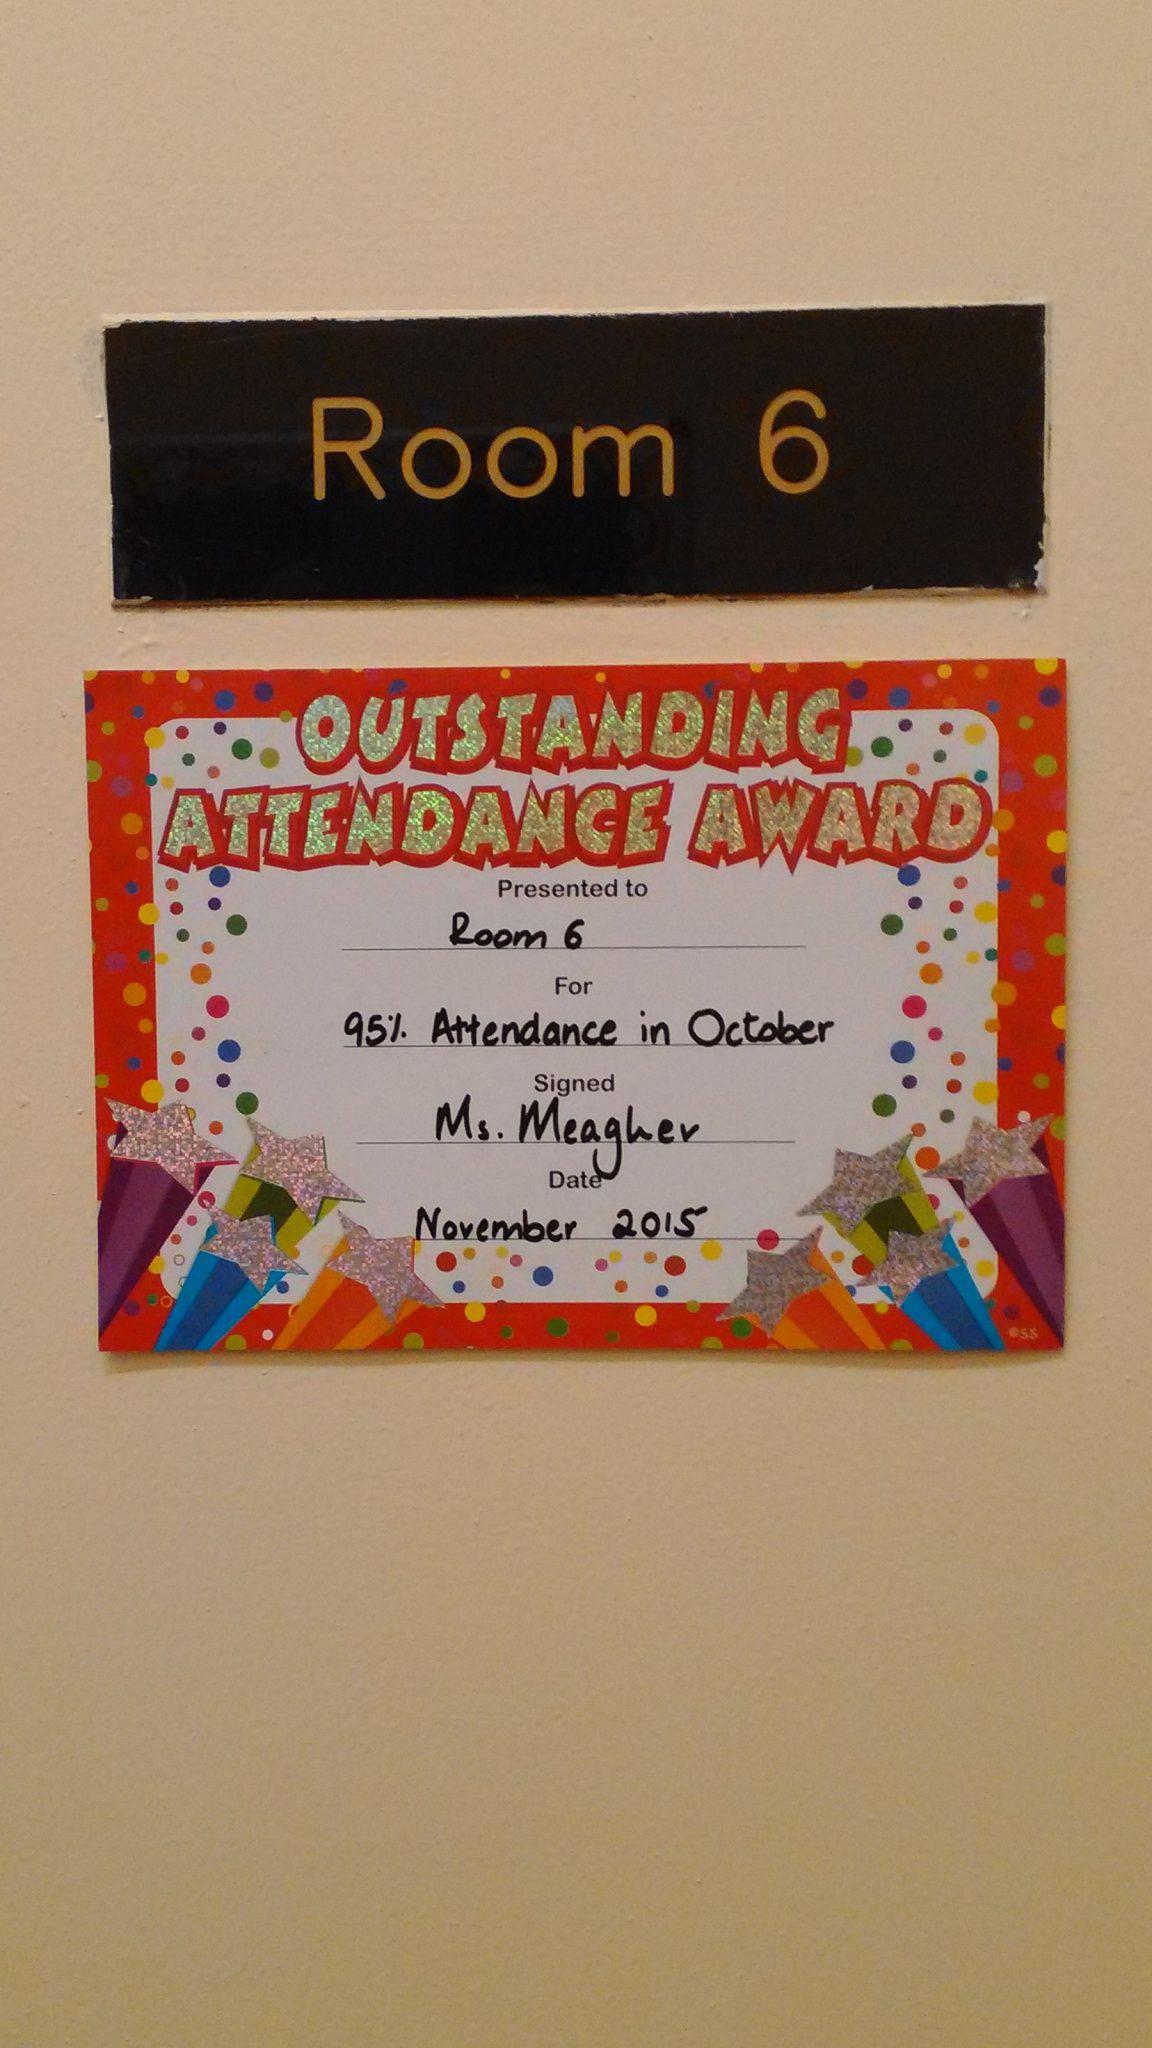 Best attendance in October!